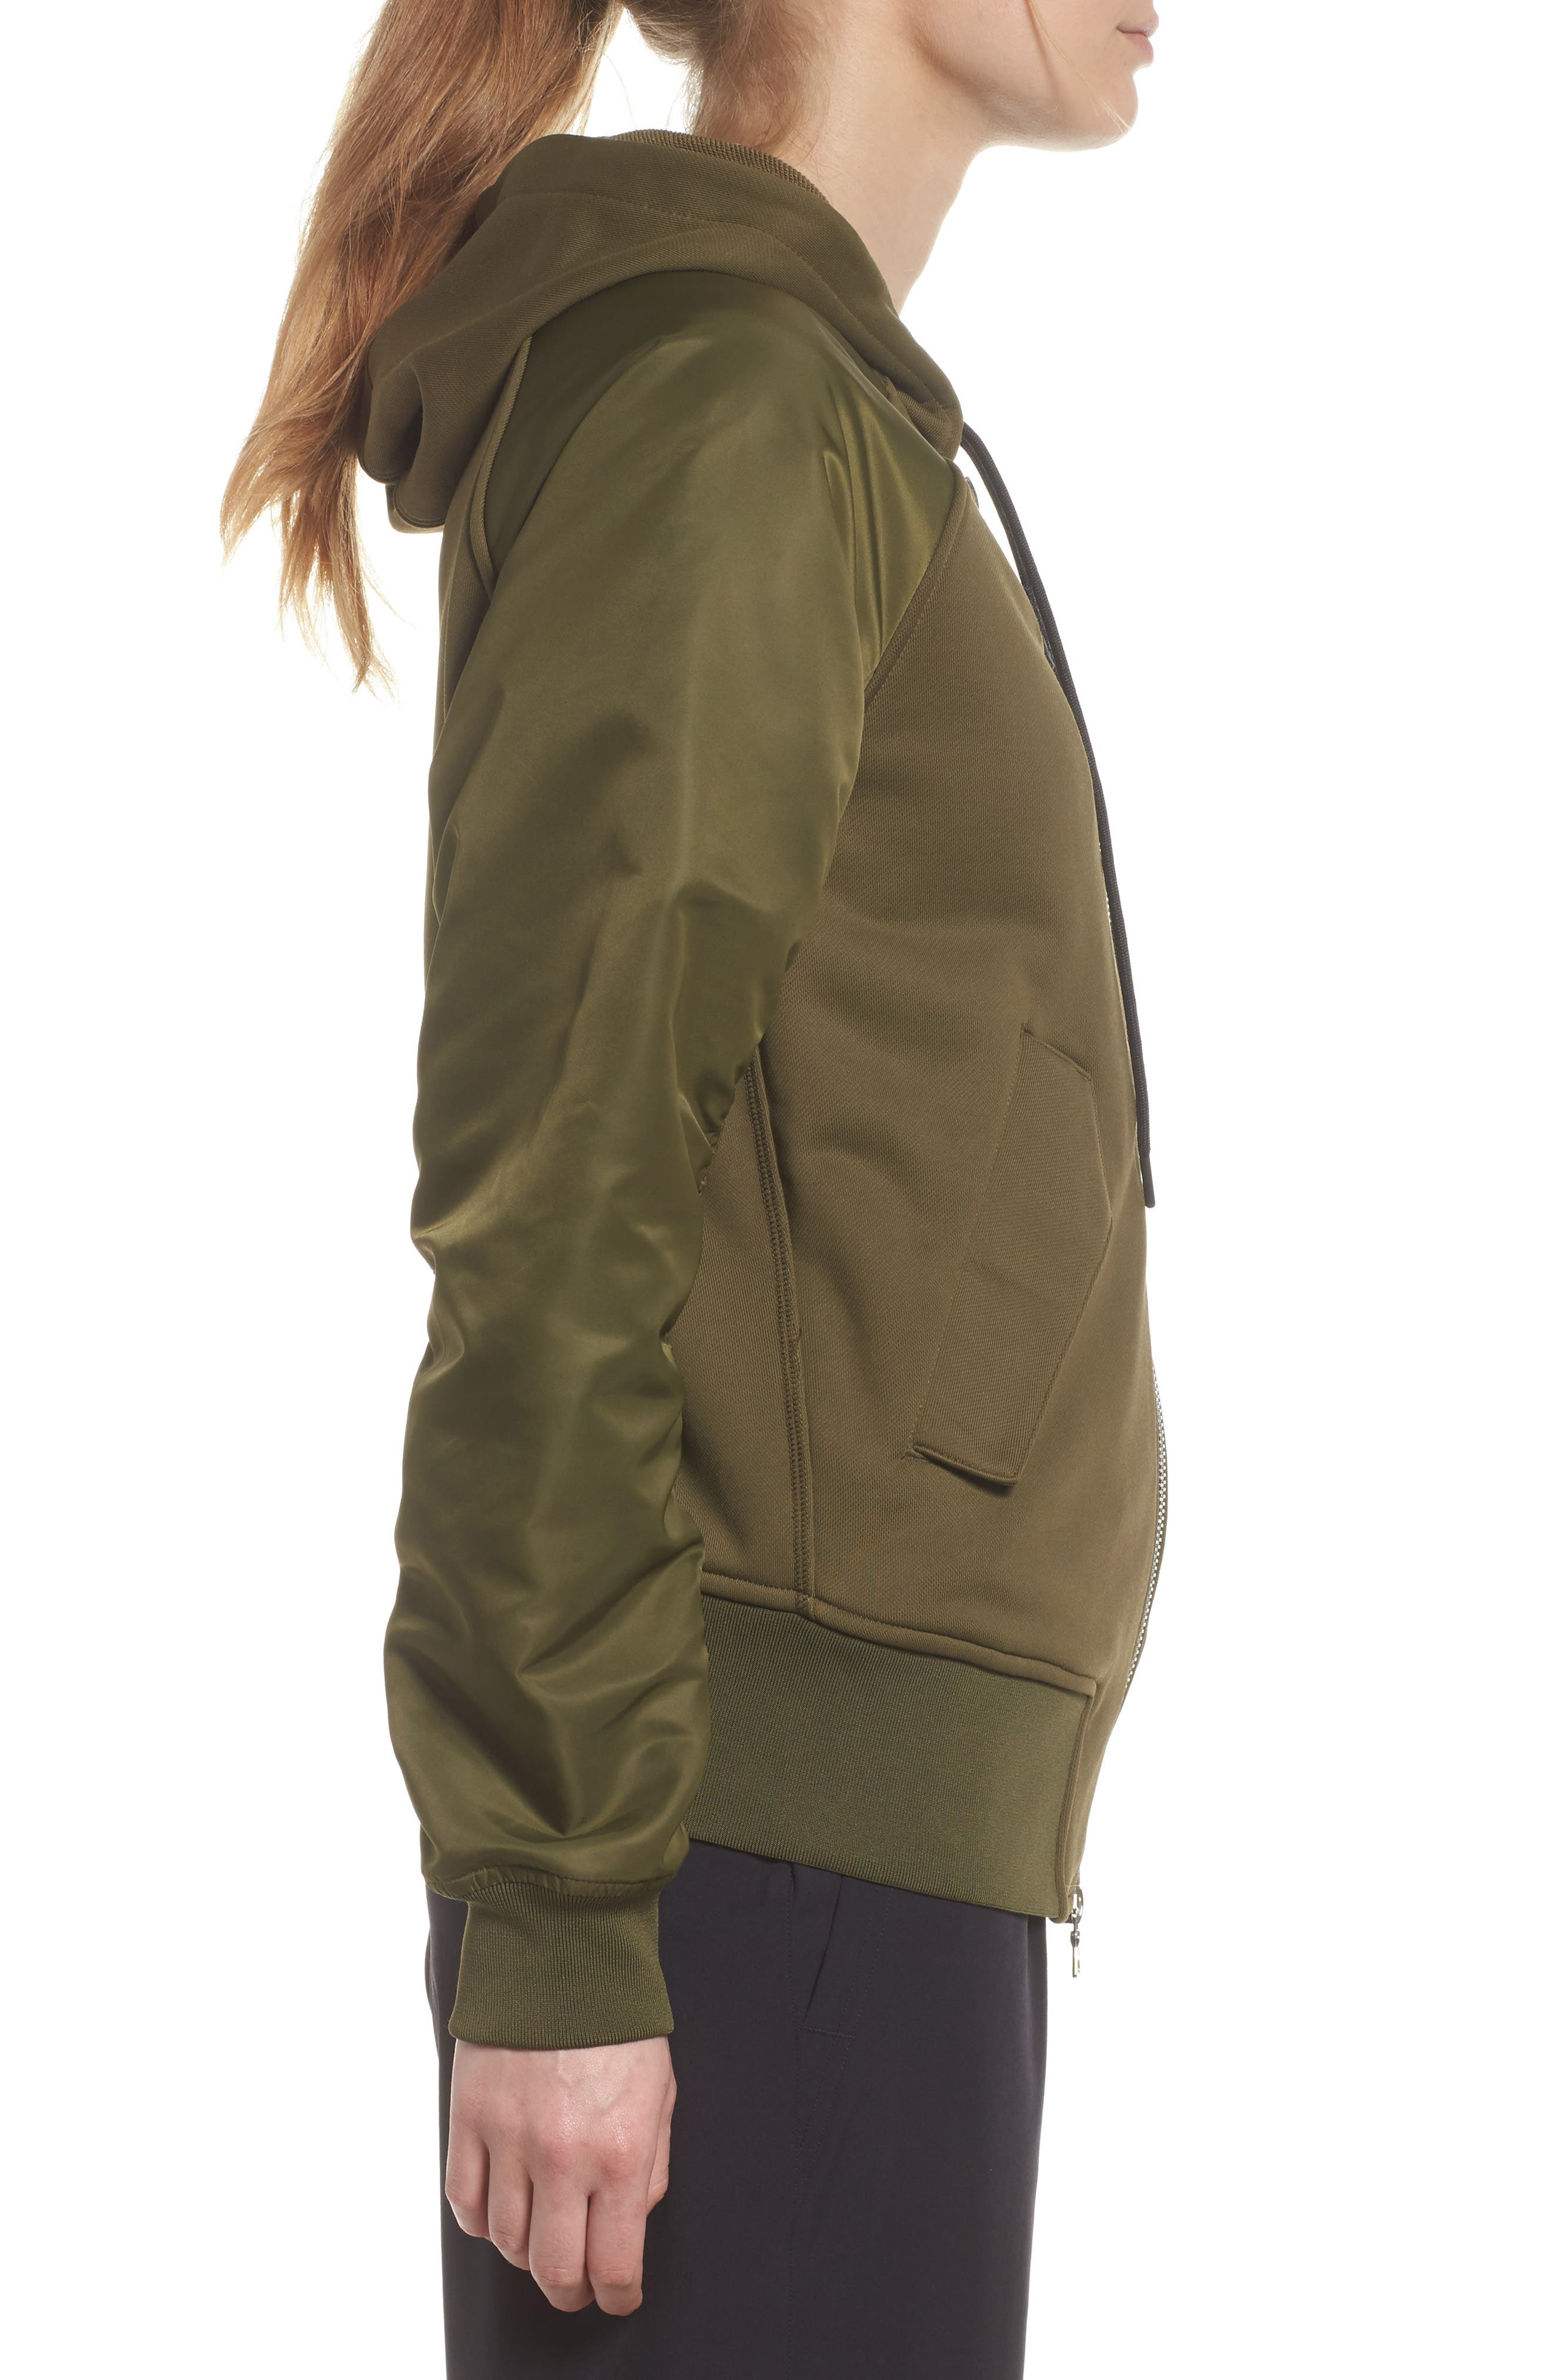 NikeLab Women's Mixed Media Bomber Jacket,                             Alternate thumbnail 3, color,                             Olive Canvas/ Black